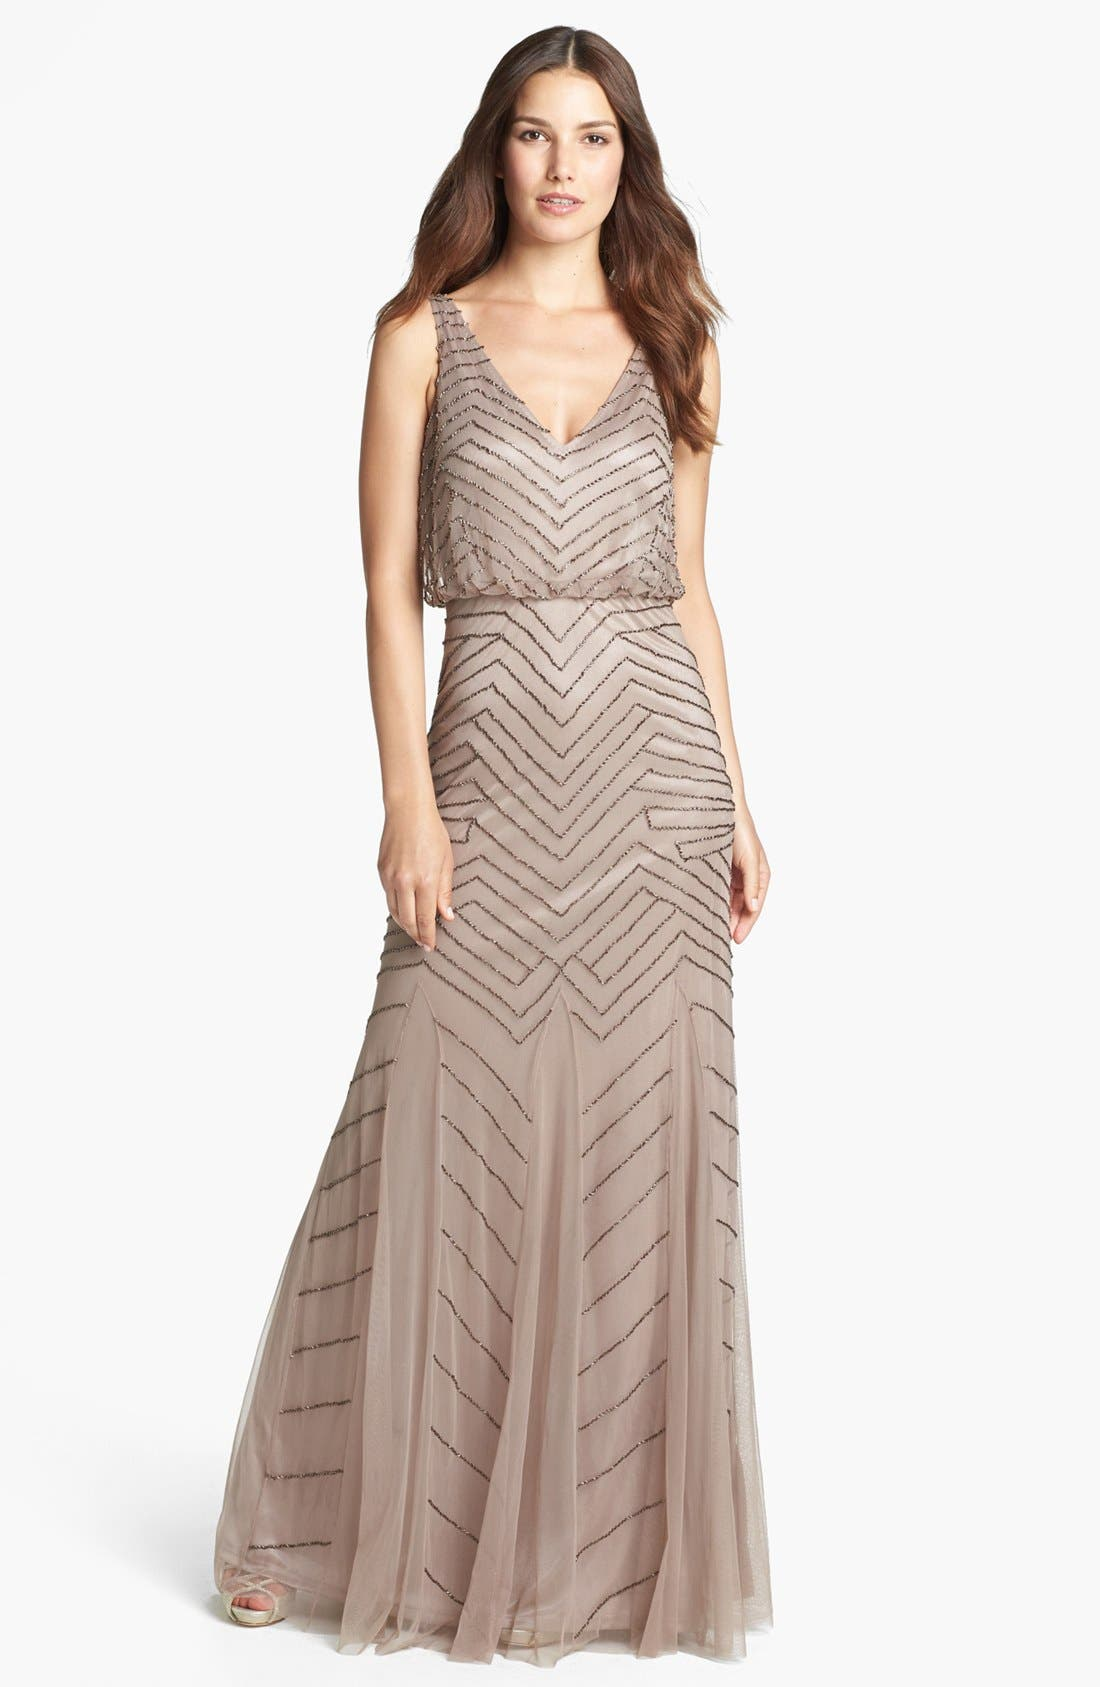 Alternate Image 1 Selected - Adrianna Papell Beaded Mesh Gown (Regular & Petite)